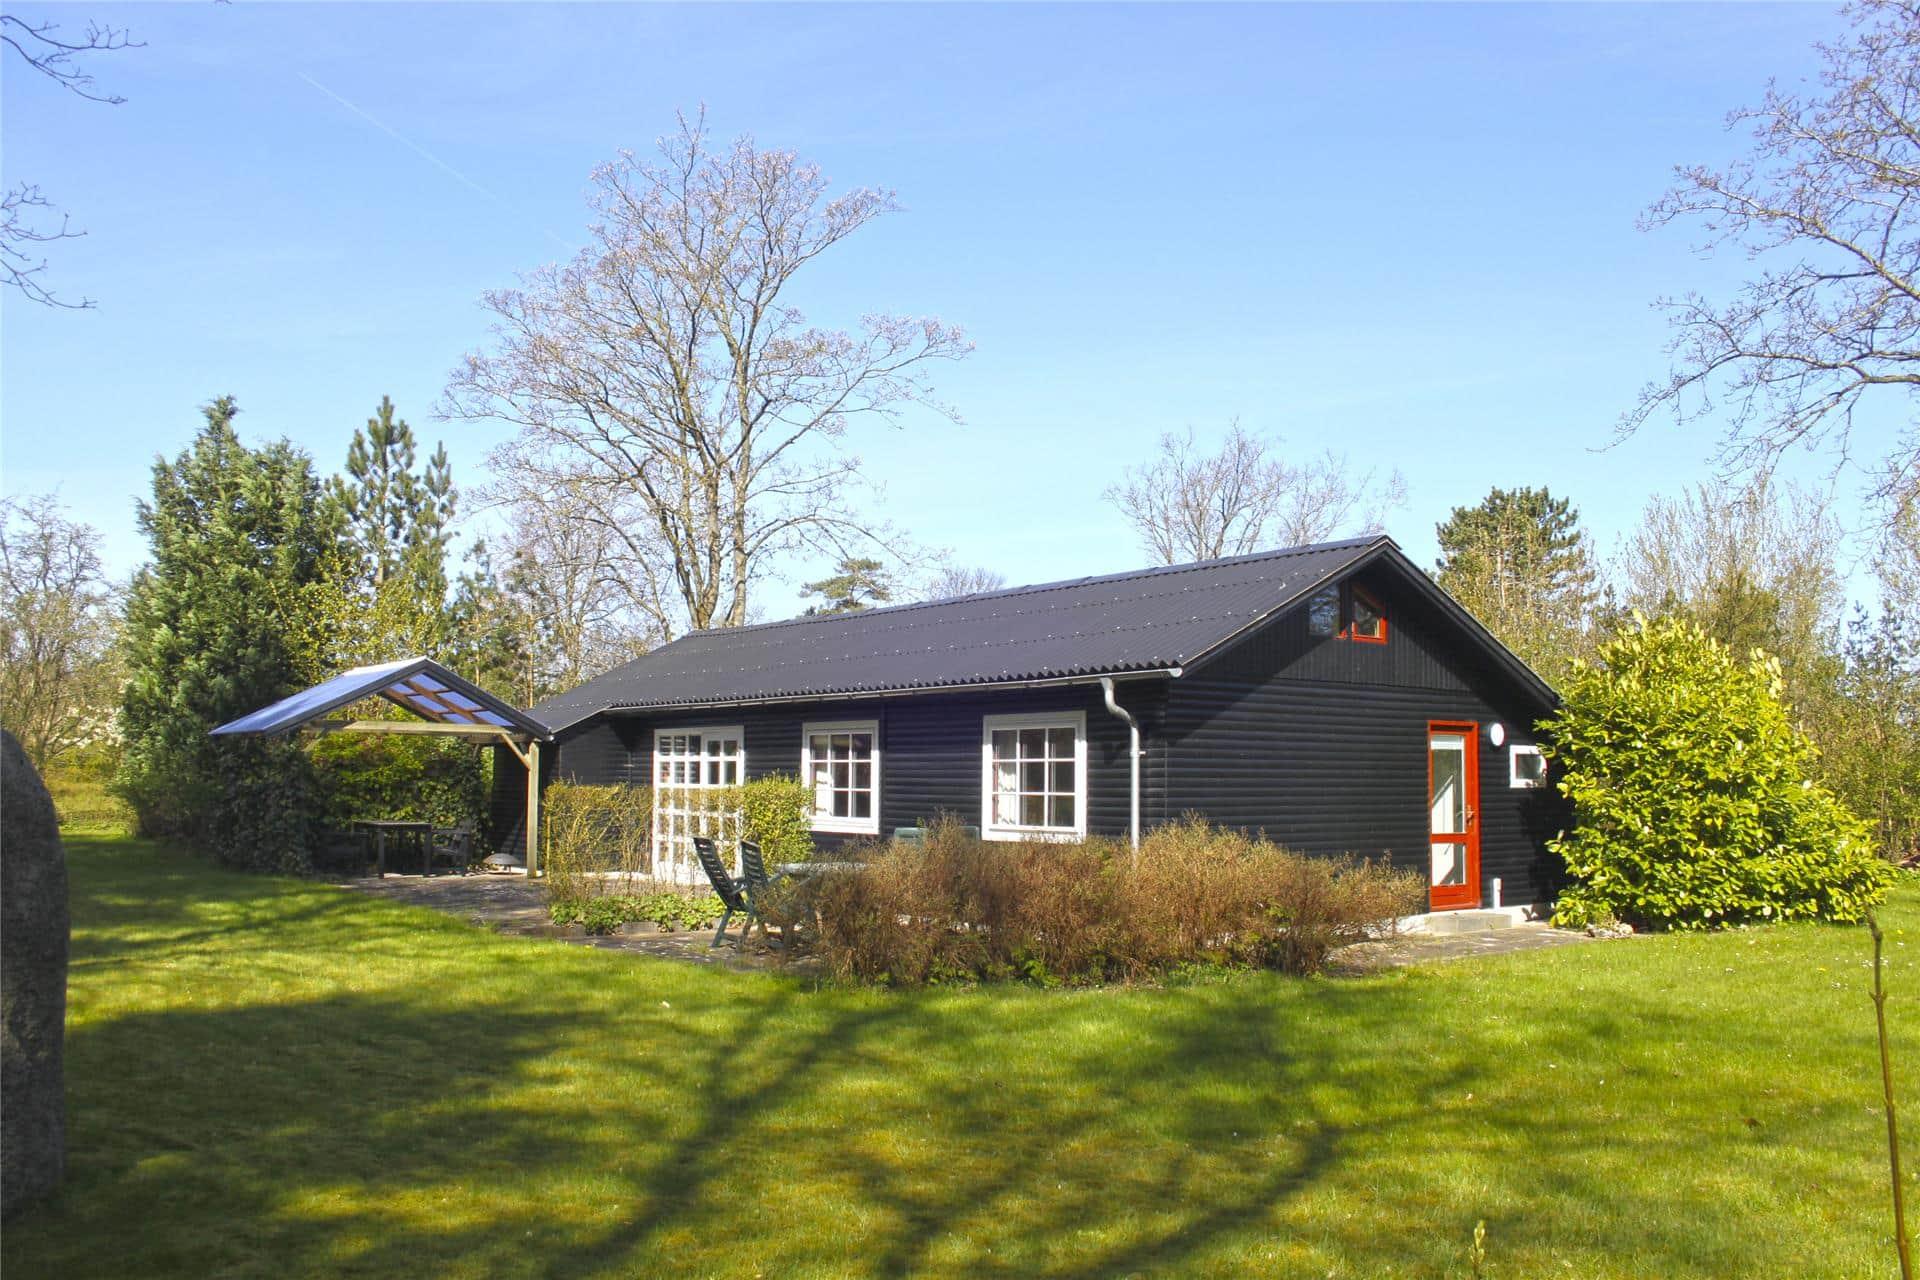 Afbeelding 1-3 Vakantiehuis L16310, Ålerusen 97, DK - 9240 Nibe